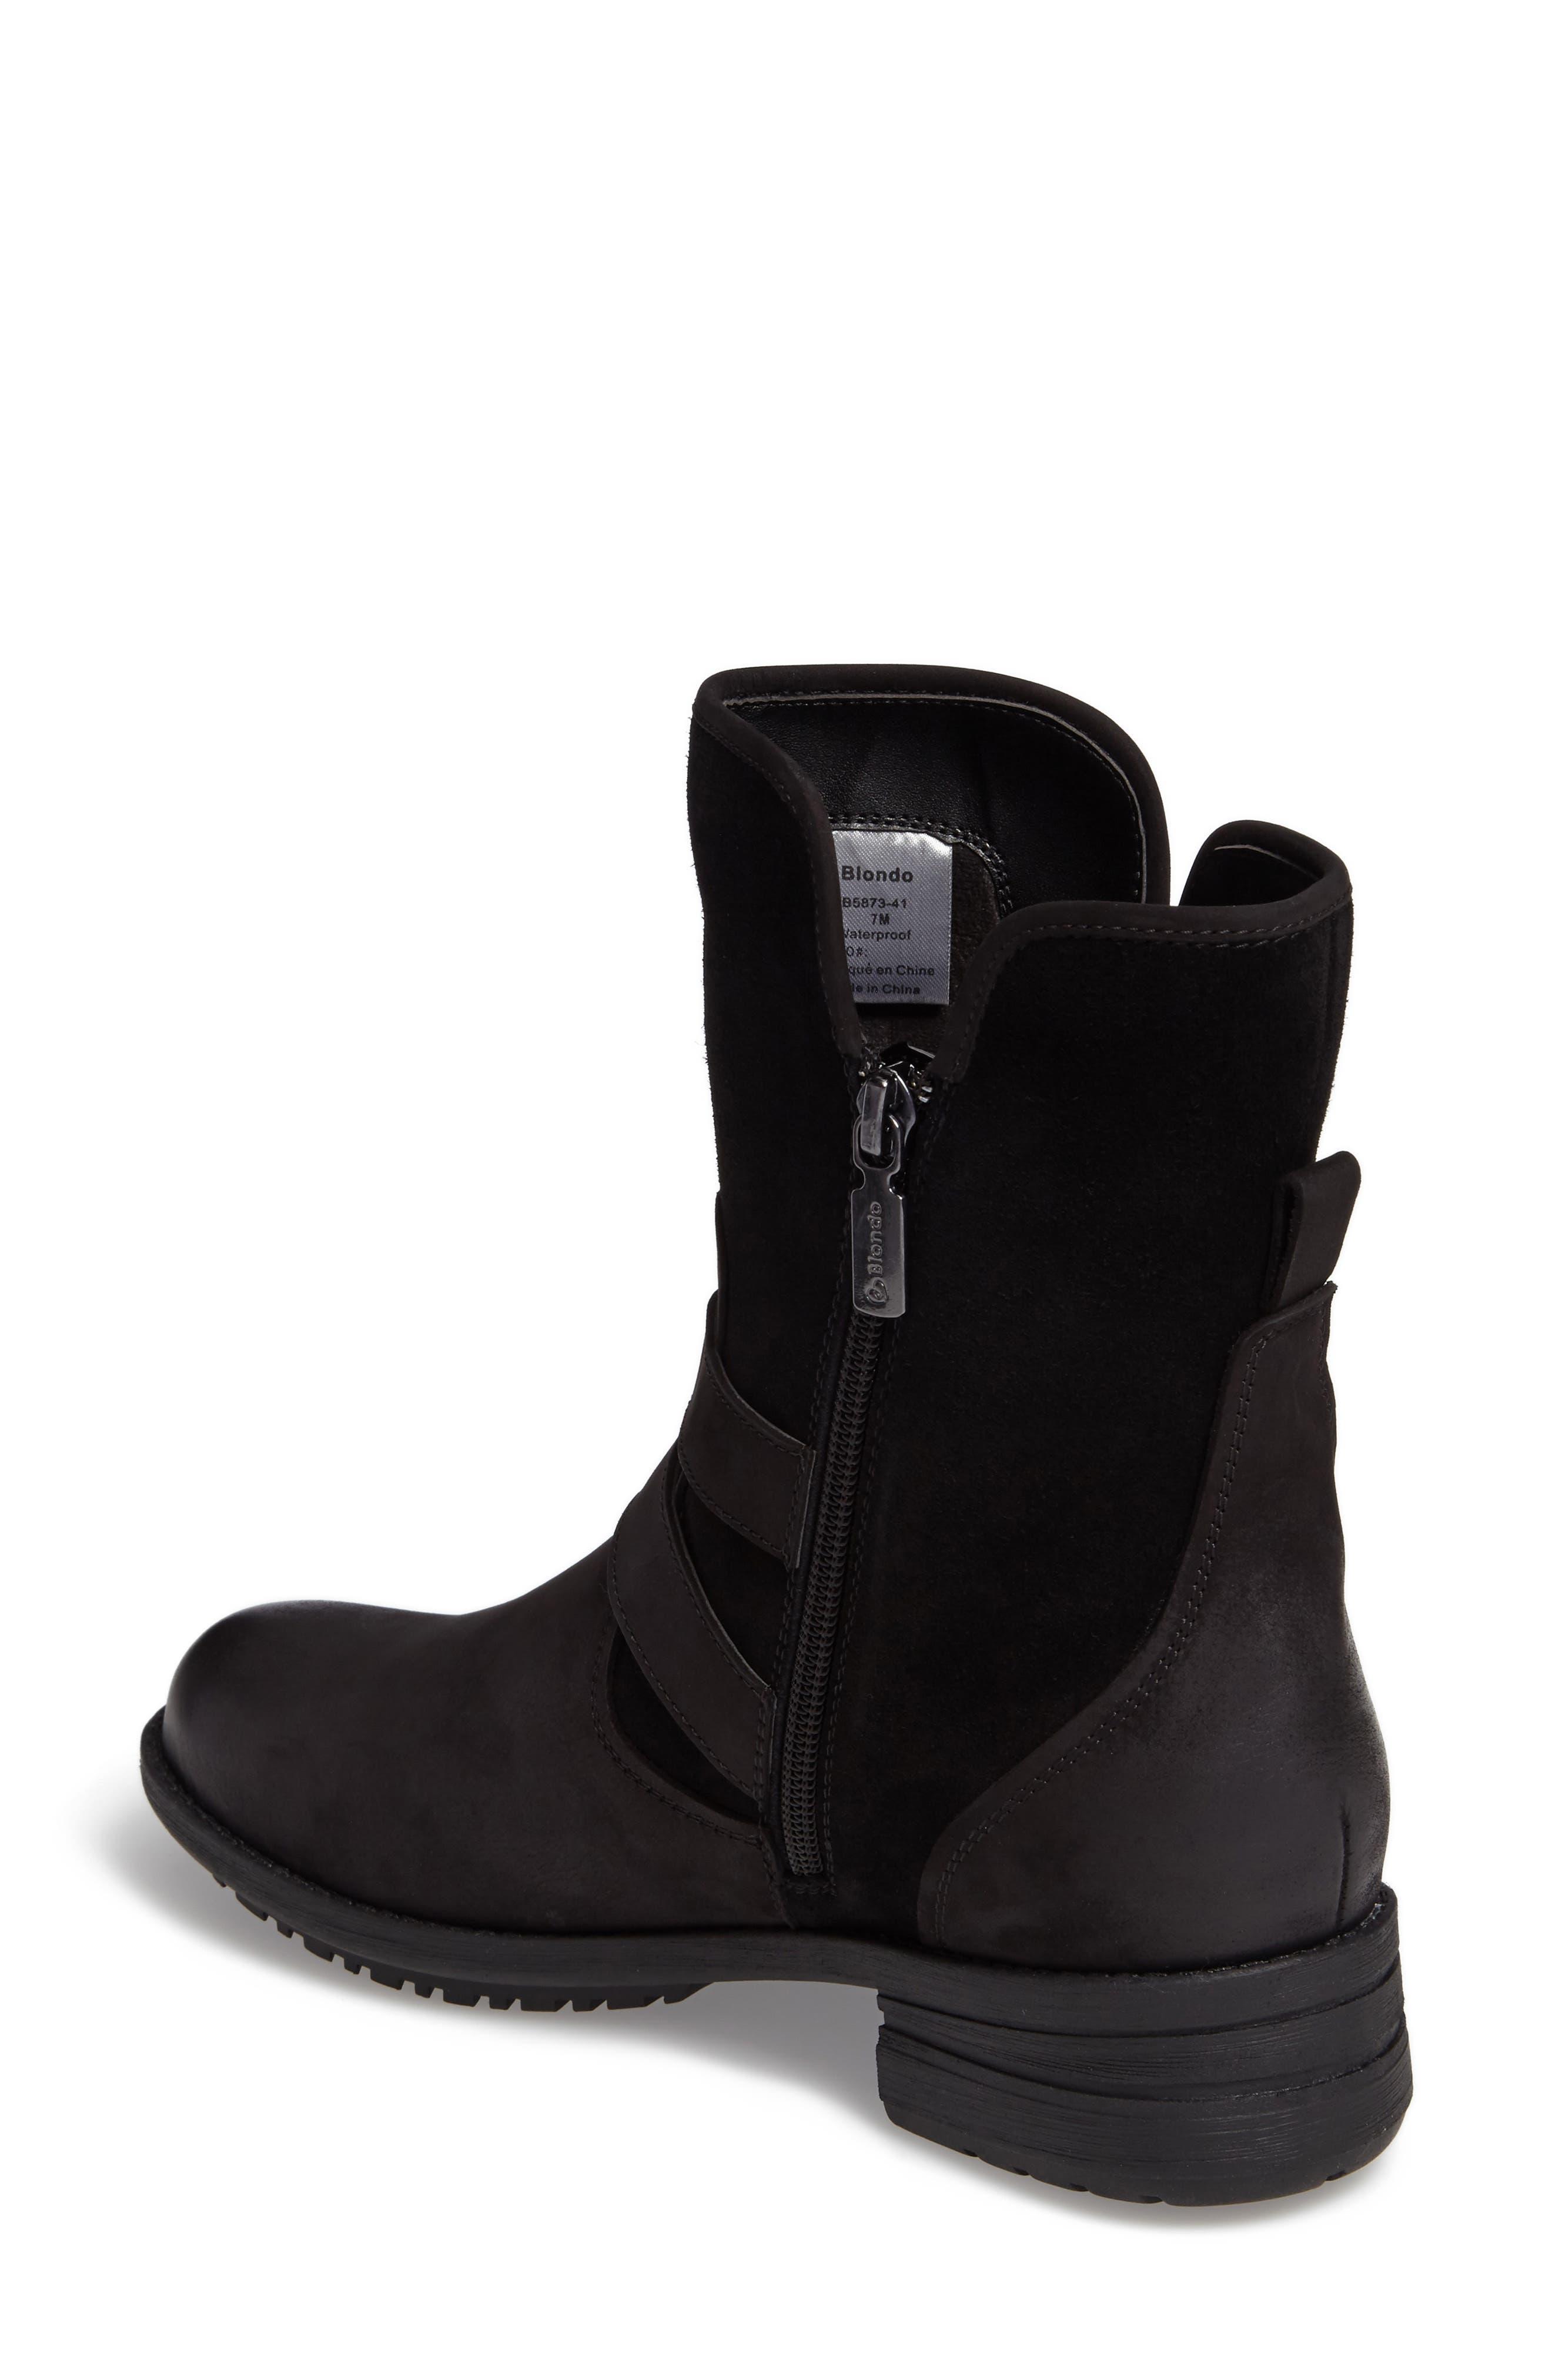 Tula Waterproof Boot,                             Alternate thumbnail 2, color,                             Black Nubuck Leather